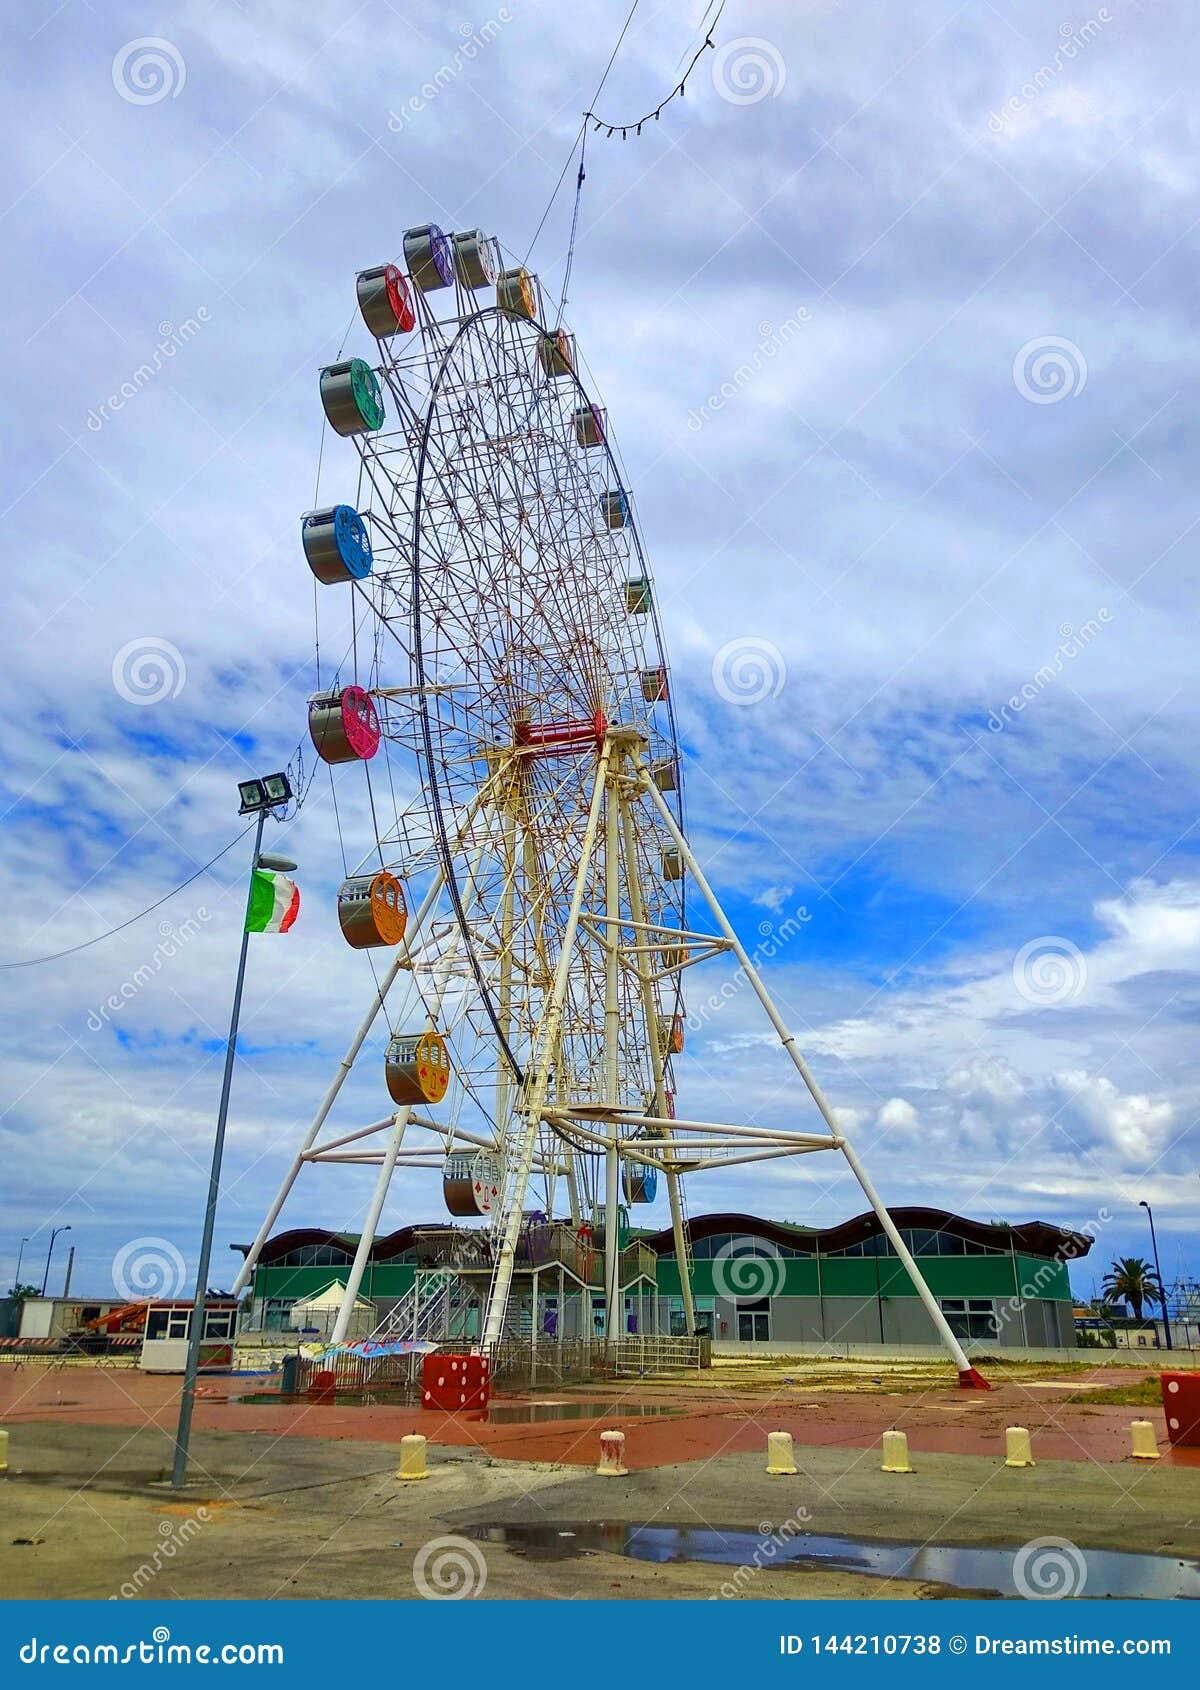 The colorful ferris wheel as a landmark in Pescara, Abruzzo, Italy